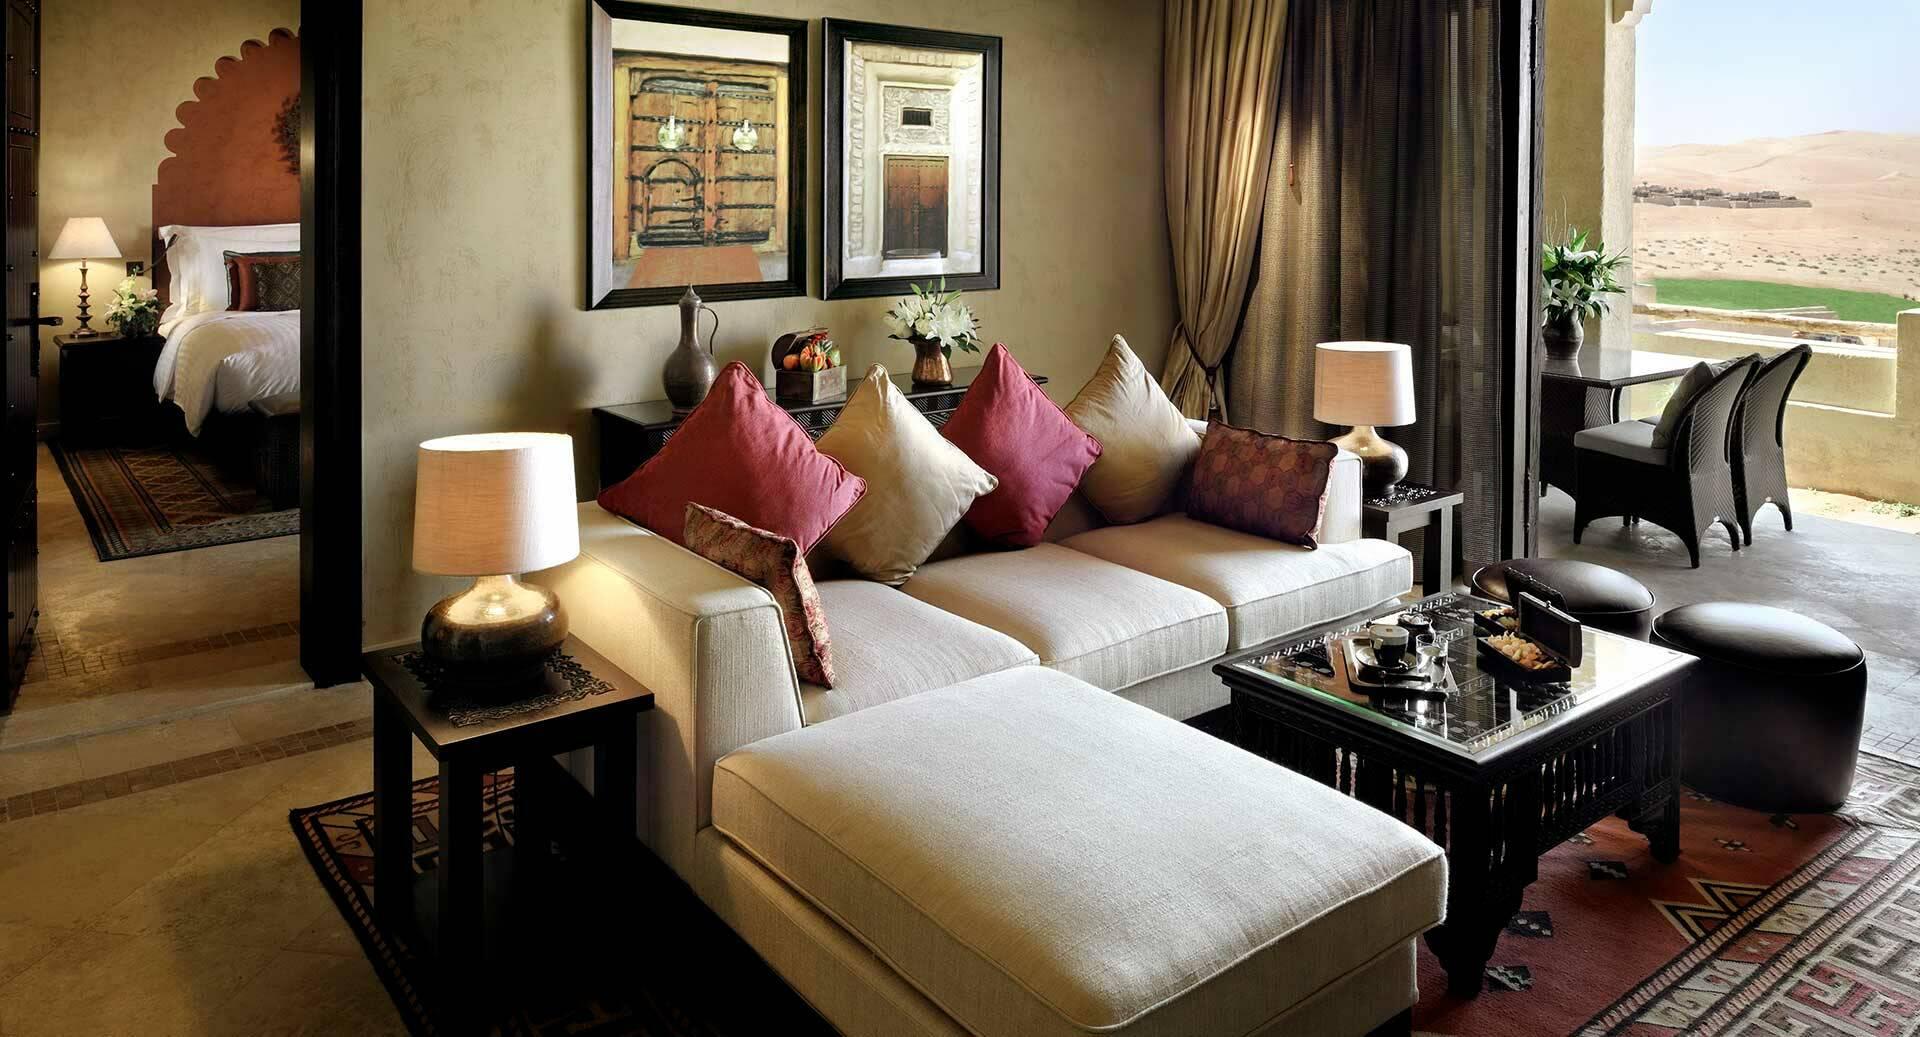 Abu Dhabi Anantara Qasr al Sarab Desert suite living room